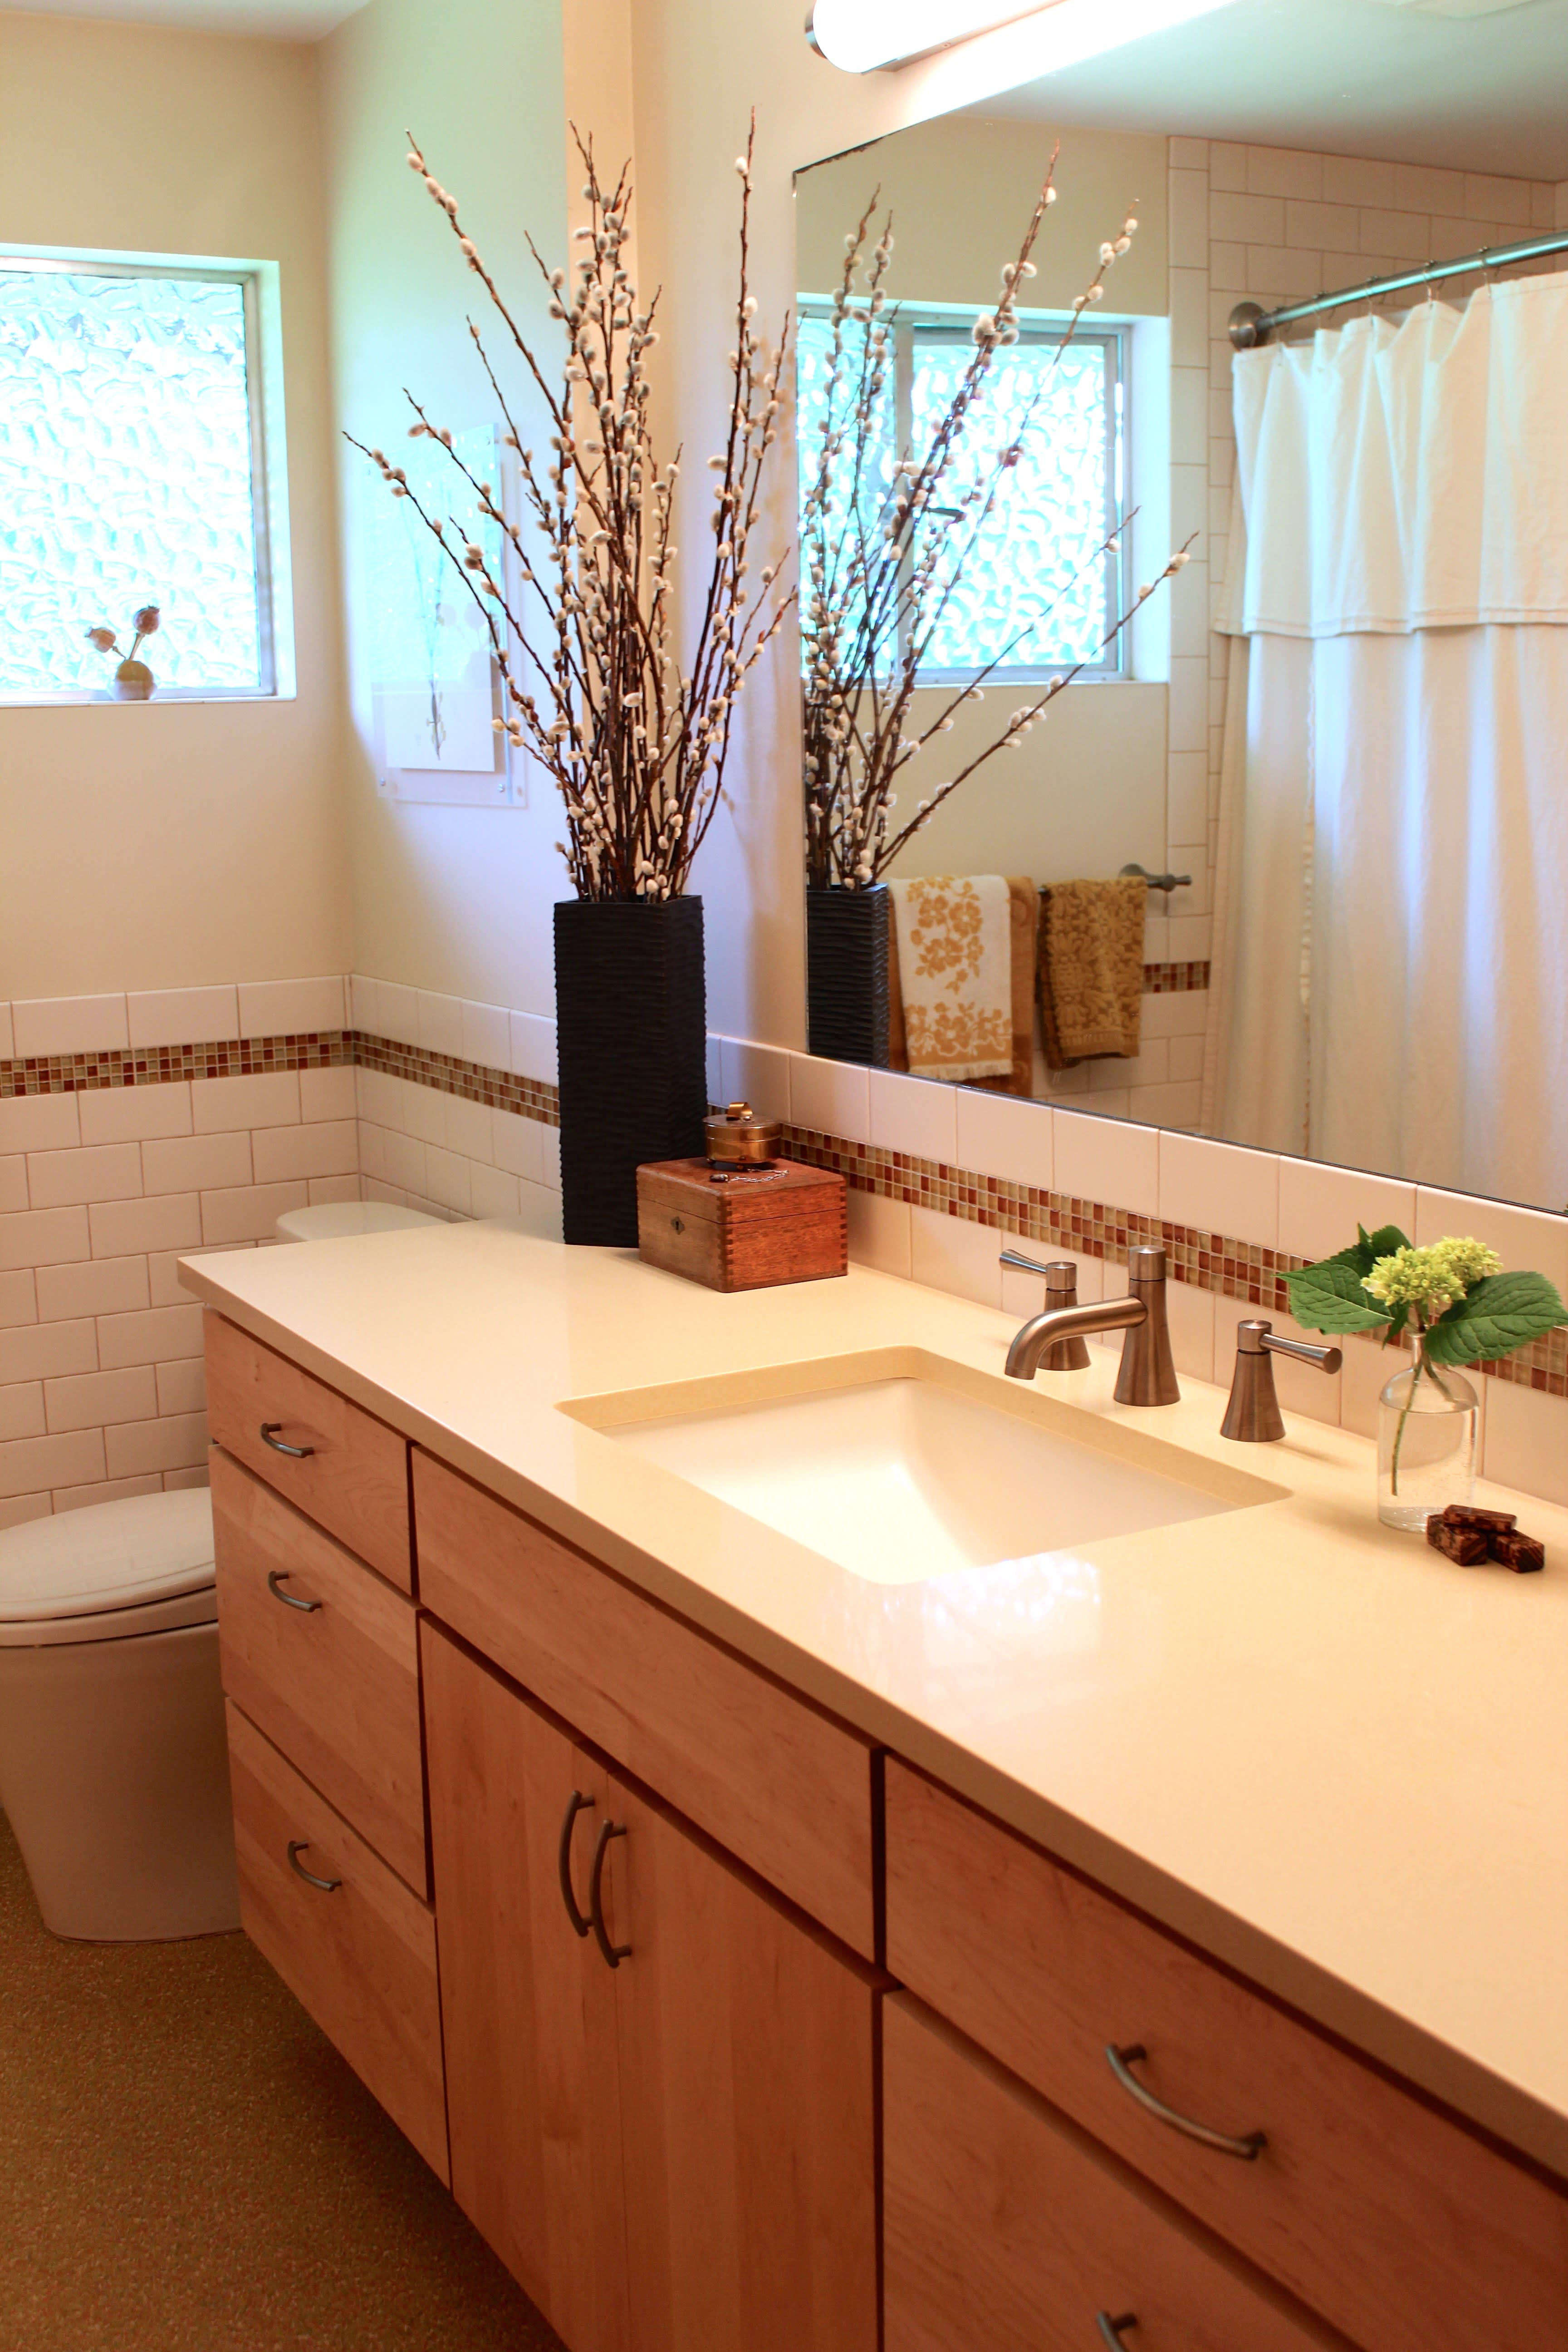 29 Split Entry Living Room Decorating Ideas Keep Home: Susan & Herb's Handmade, Mid-Century Split Level